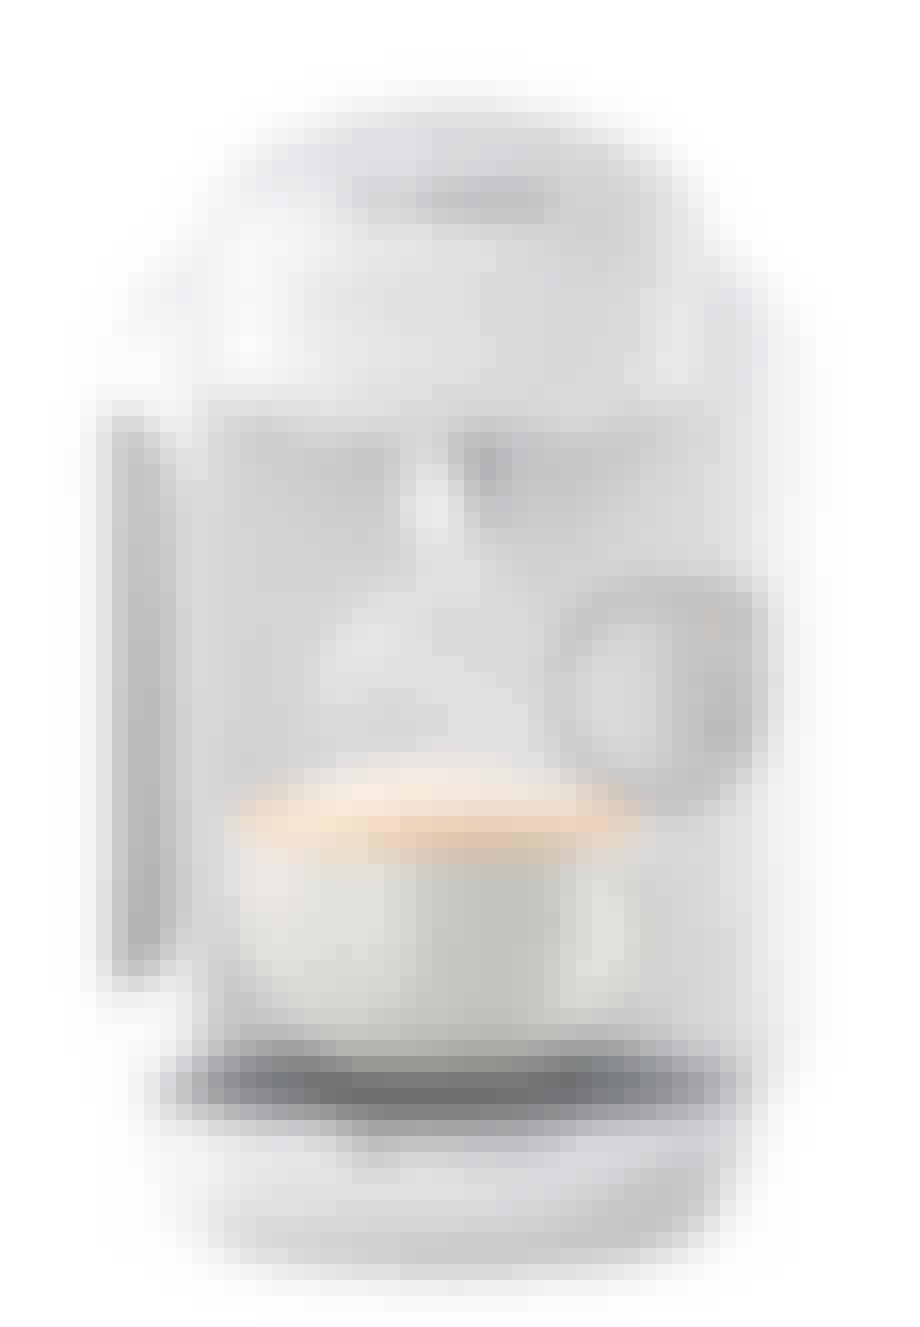 Bosch Tassimo, TAS1404, 1.299 DKK